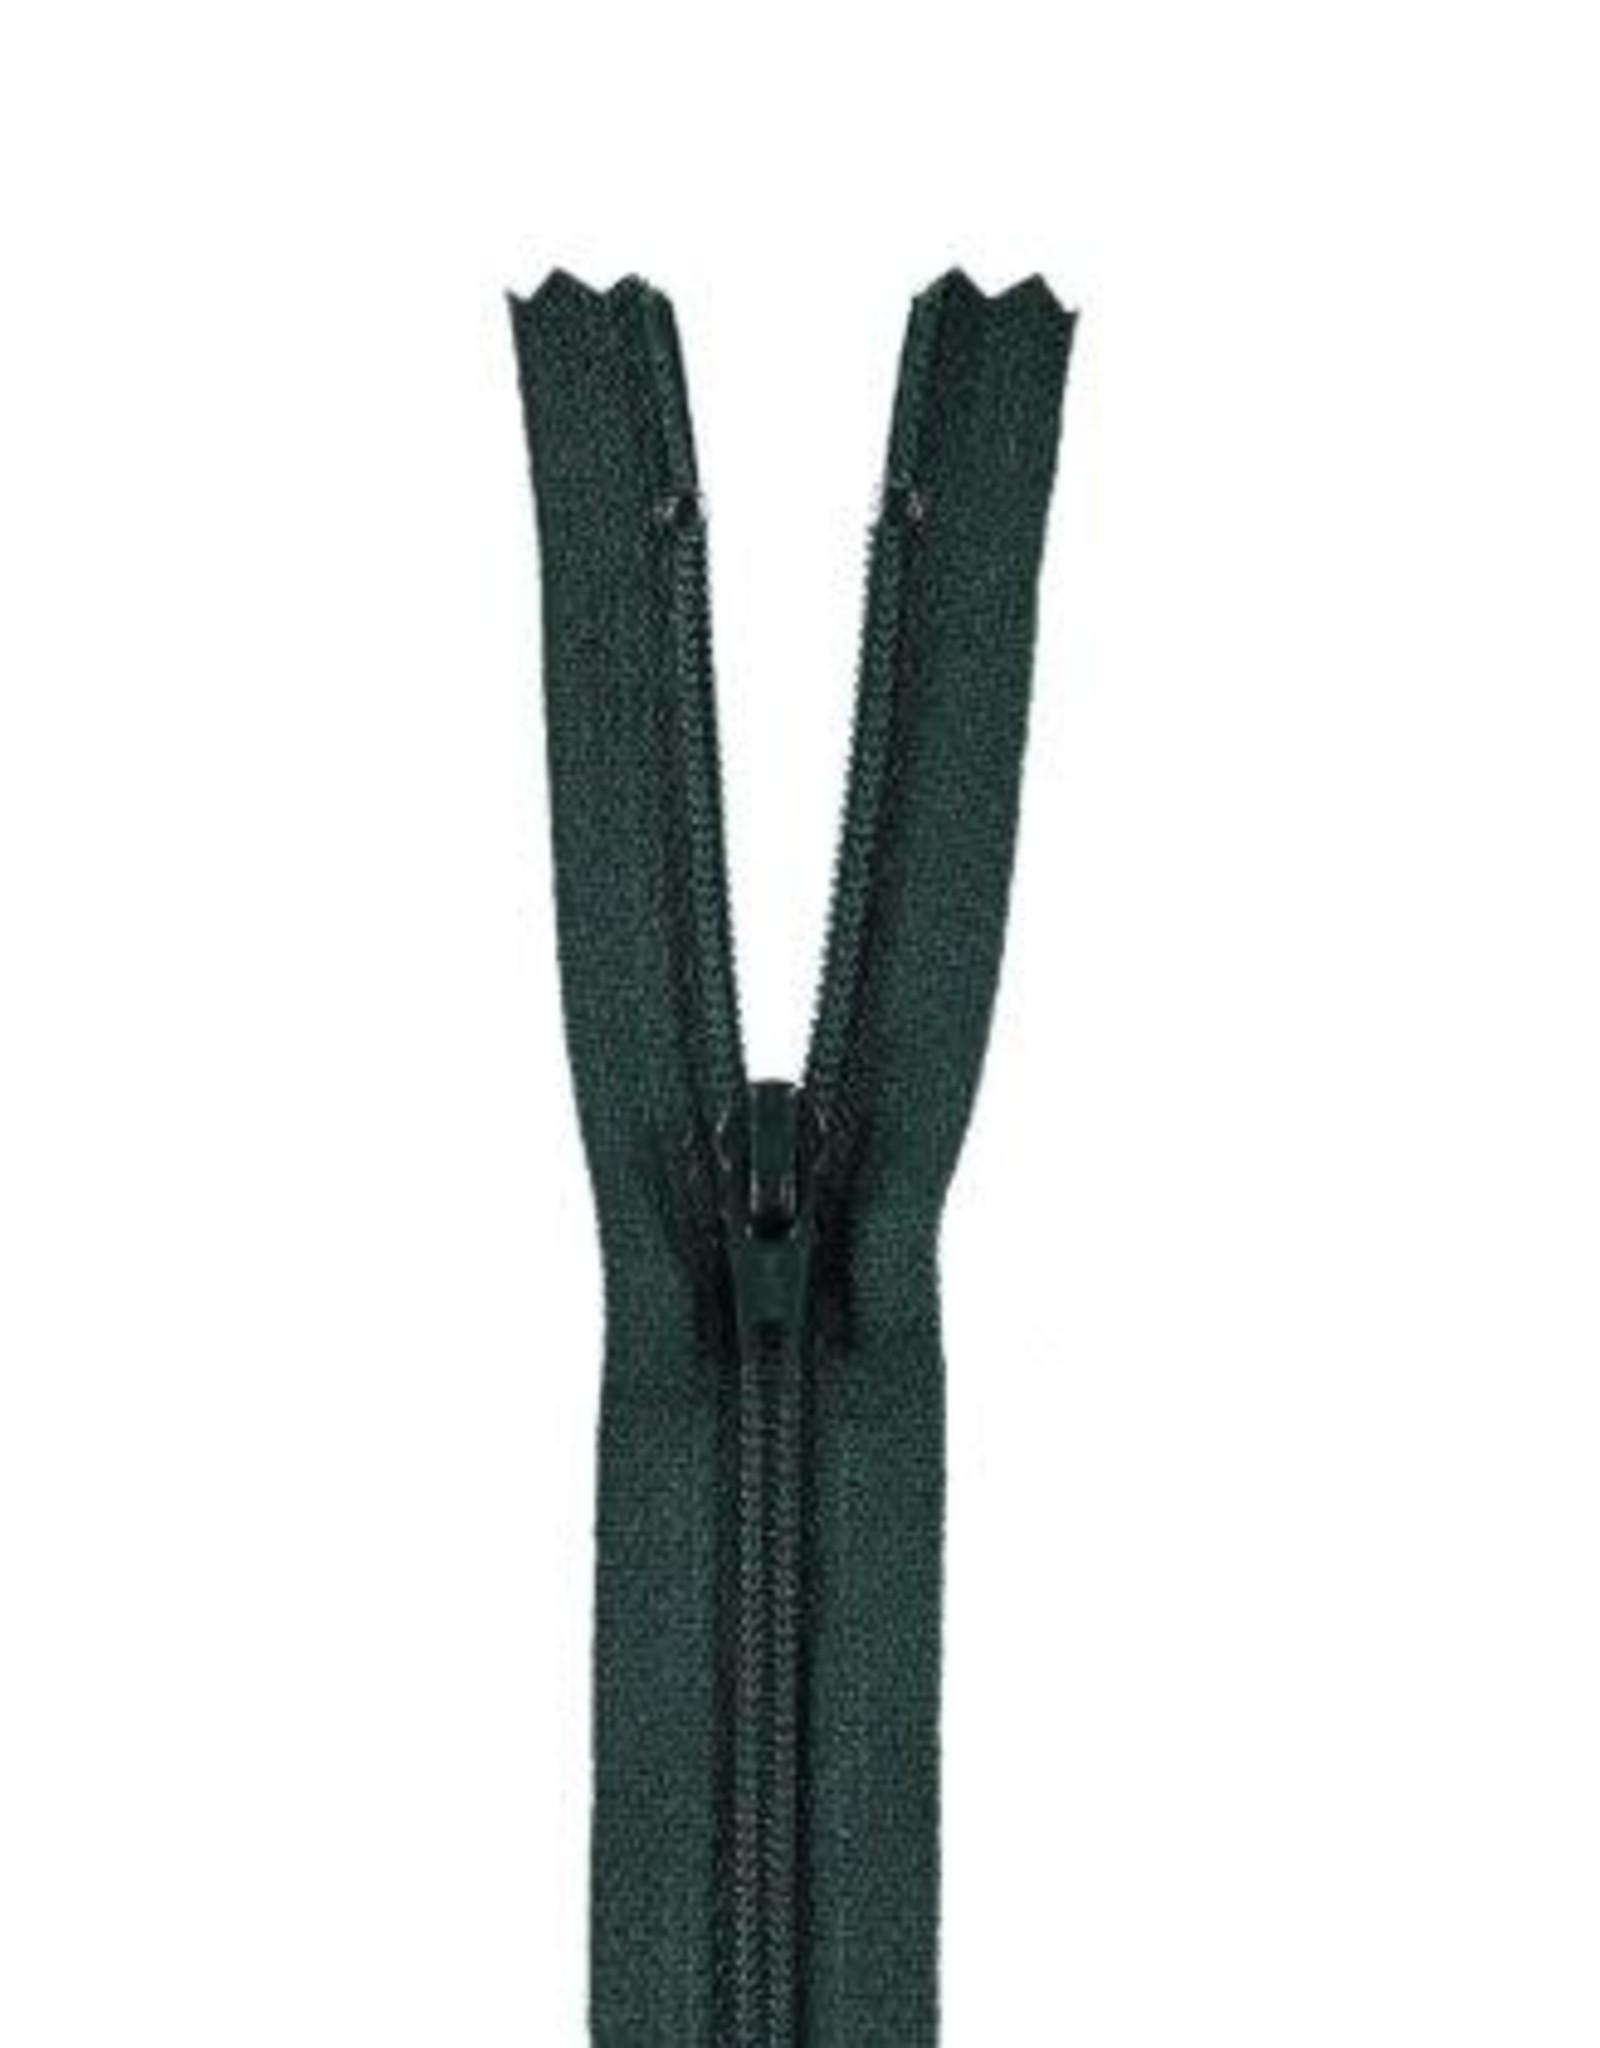 YKK Spiraalrits niet-DB 3mm donker groen 890-55cm